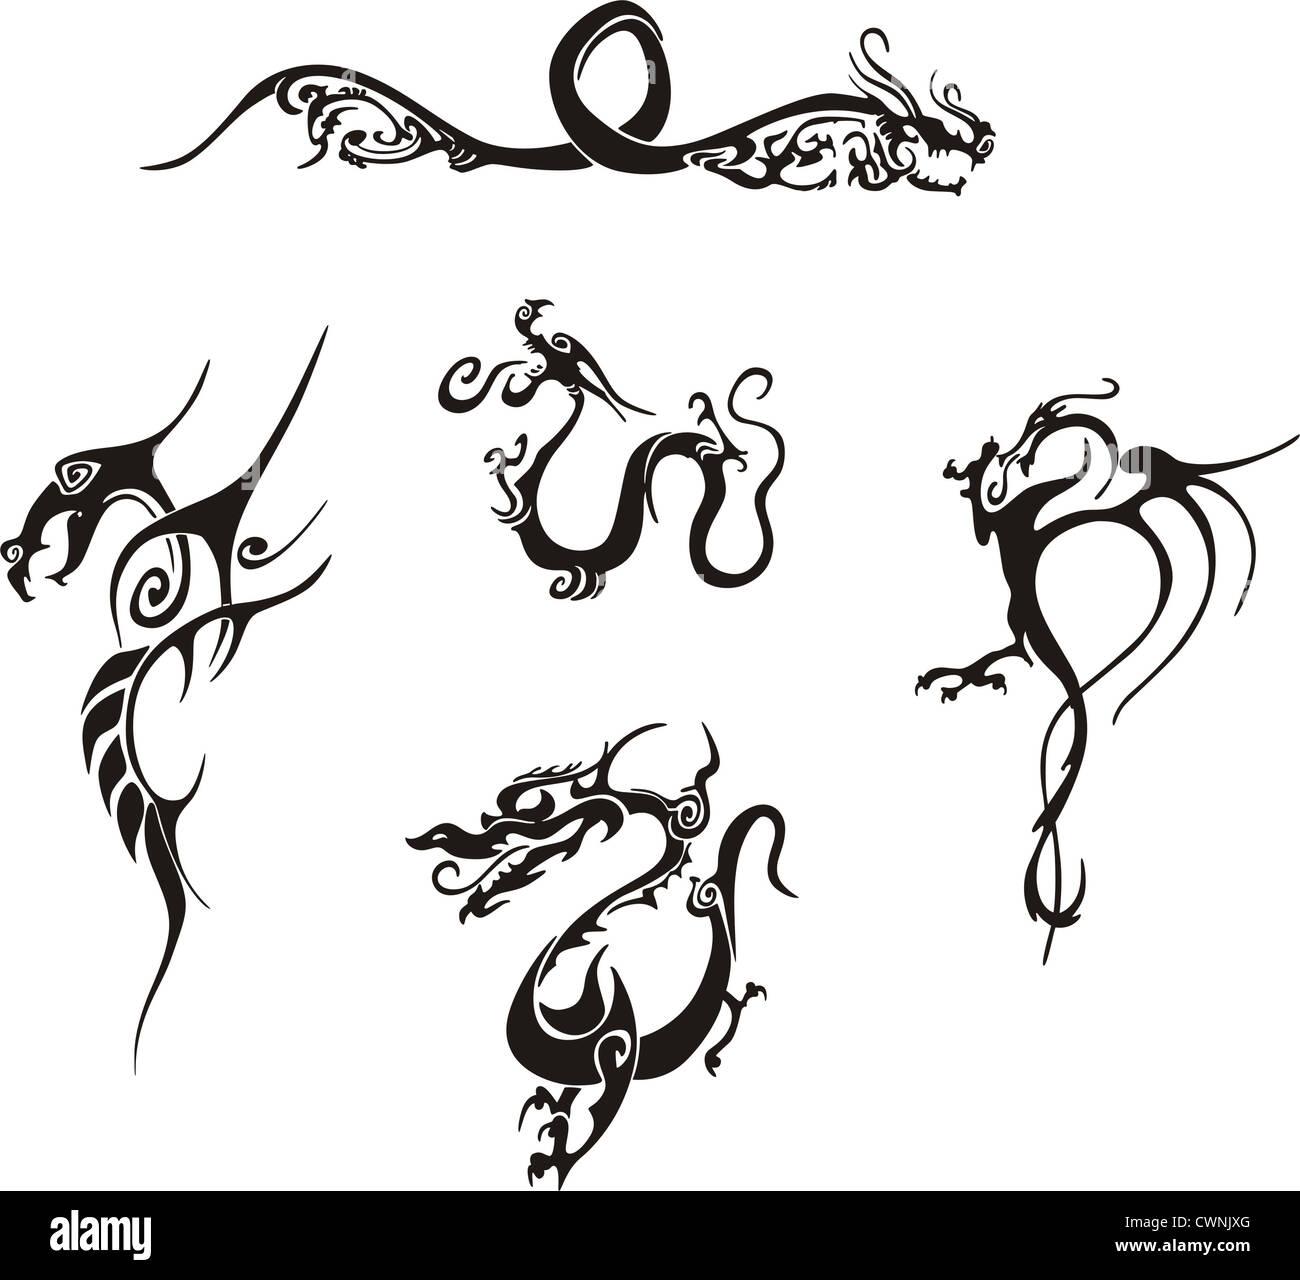 Dragons Tattoos Designs Stock Photos & Dragons Tattoos Designs Stock ...